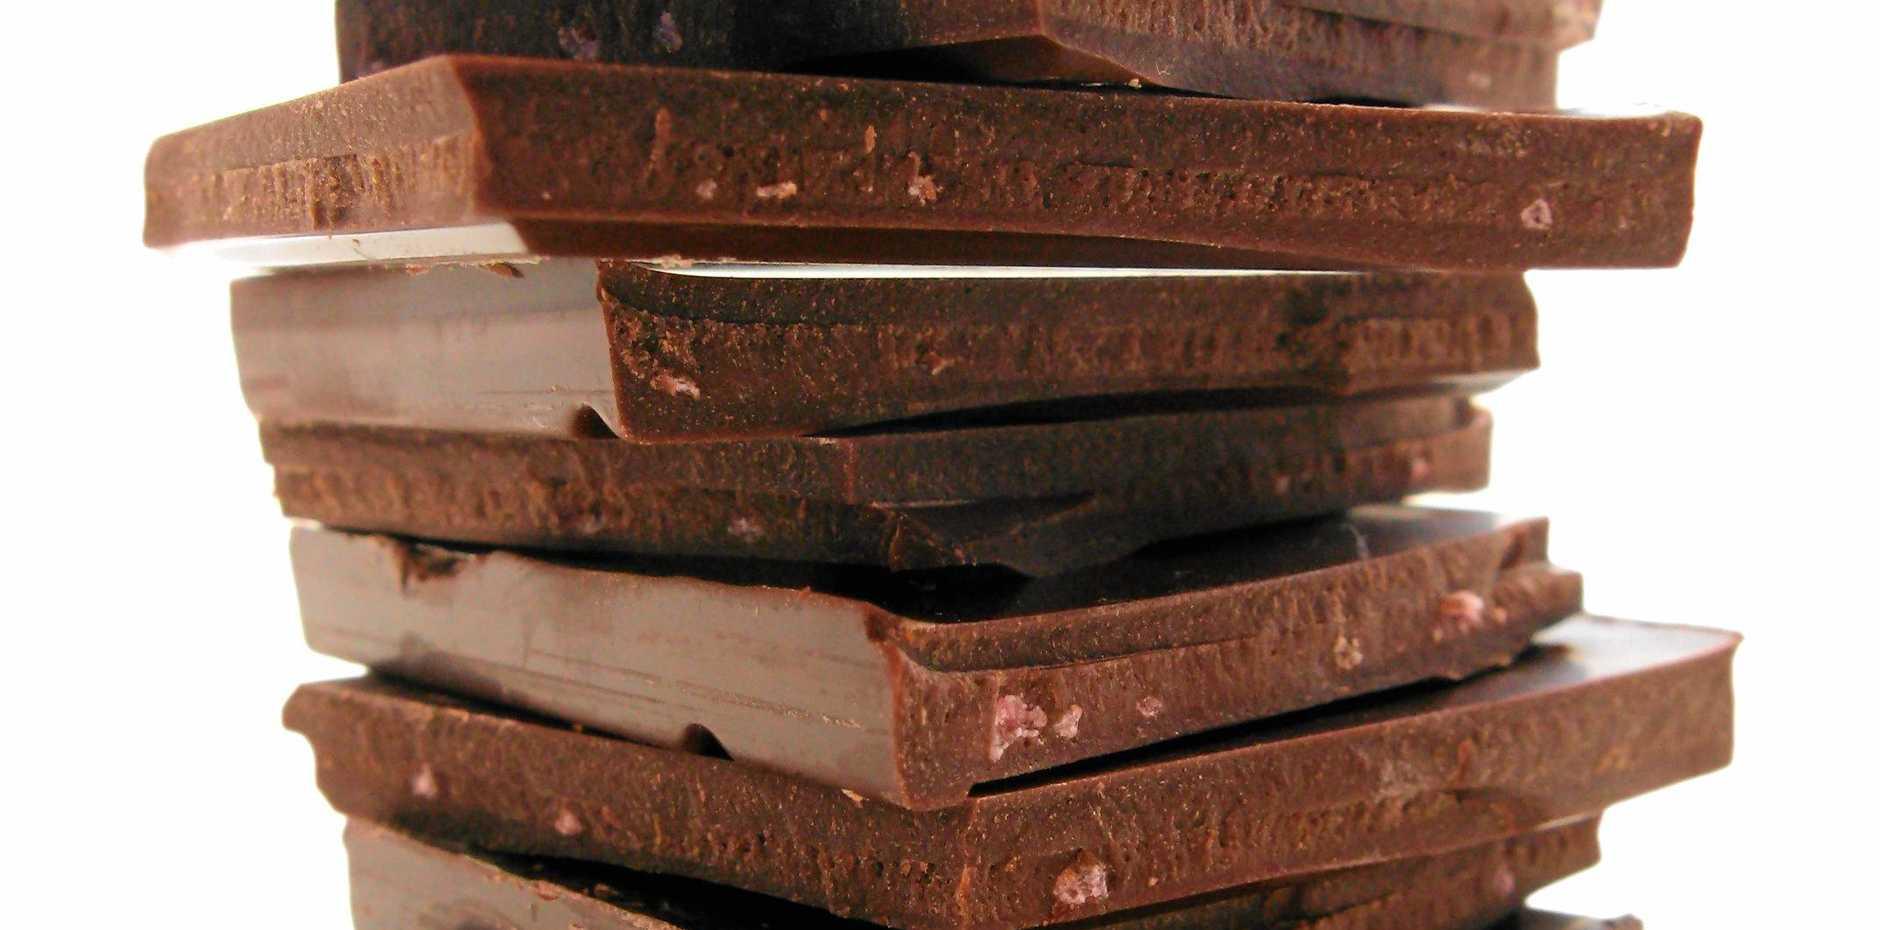 A year's worth of chocolate can be won at San Churro.